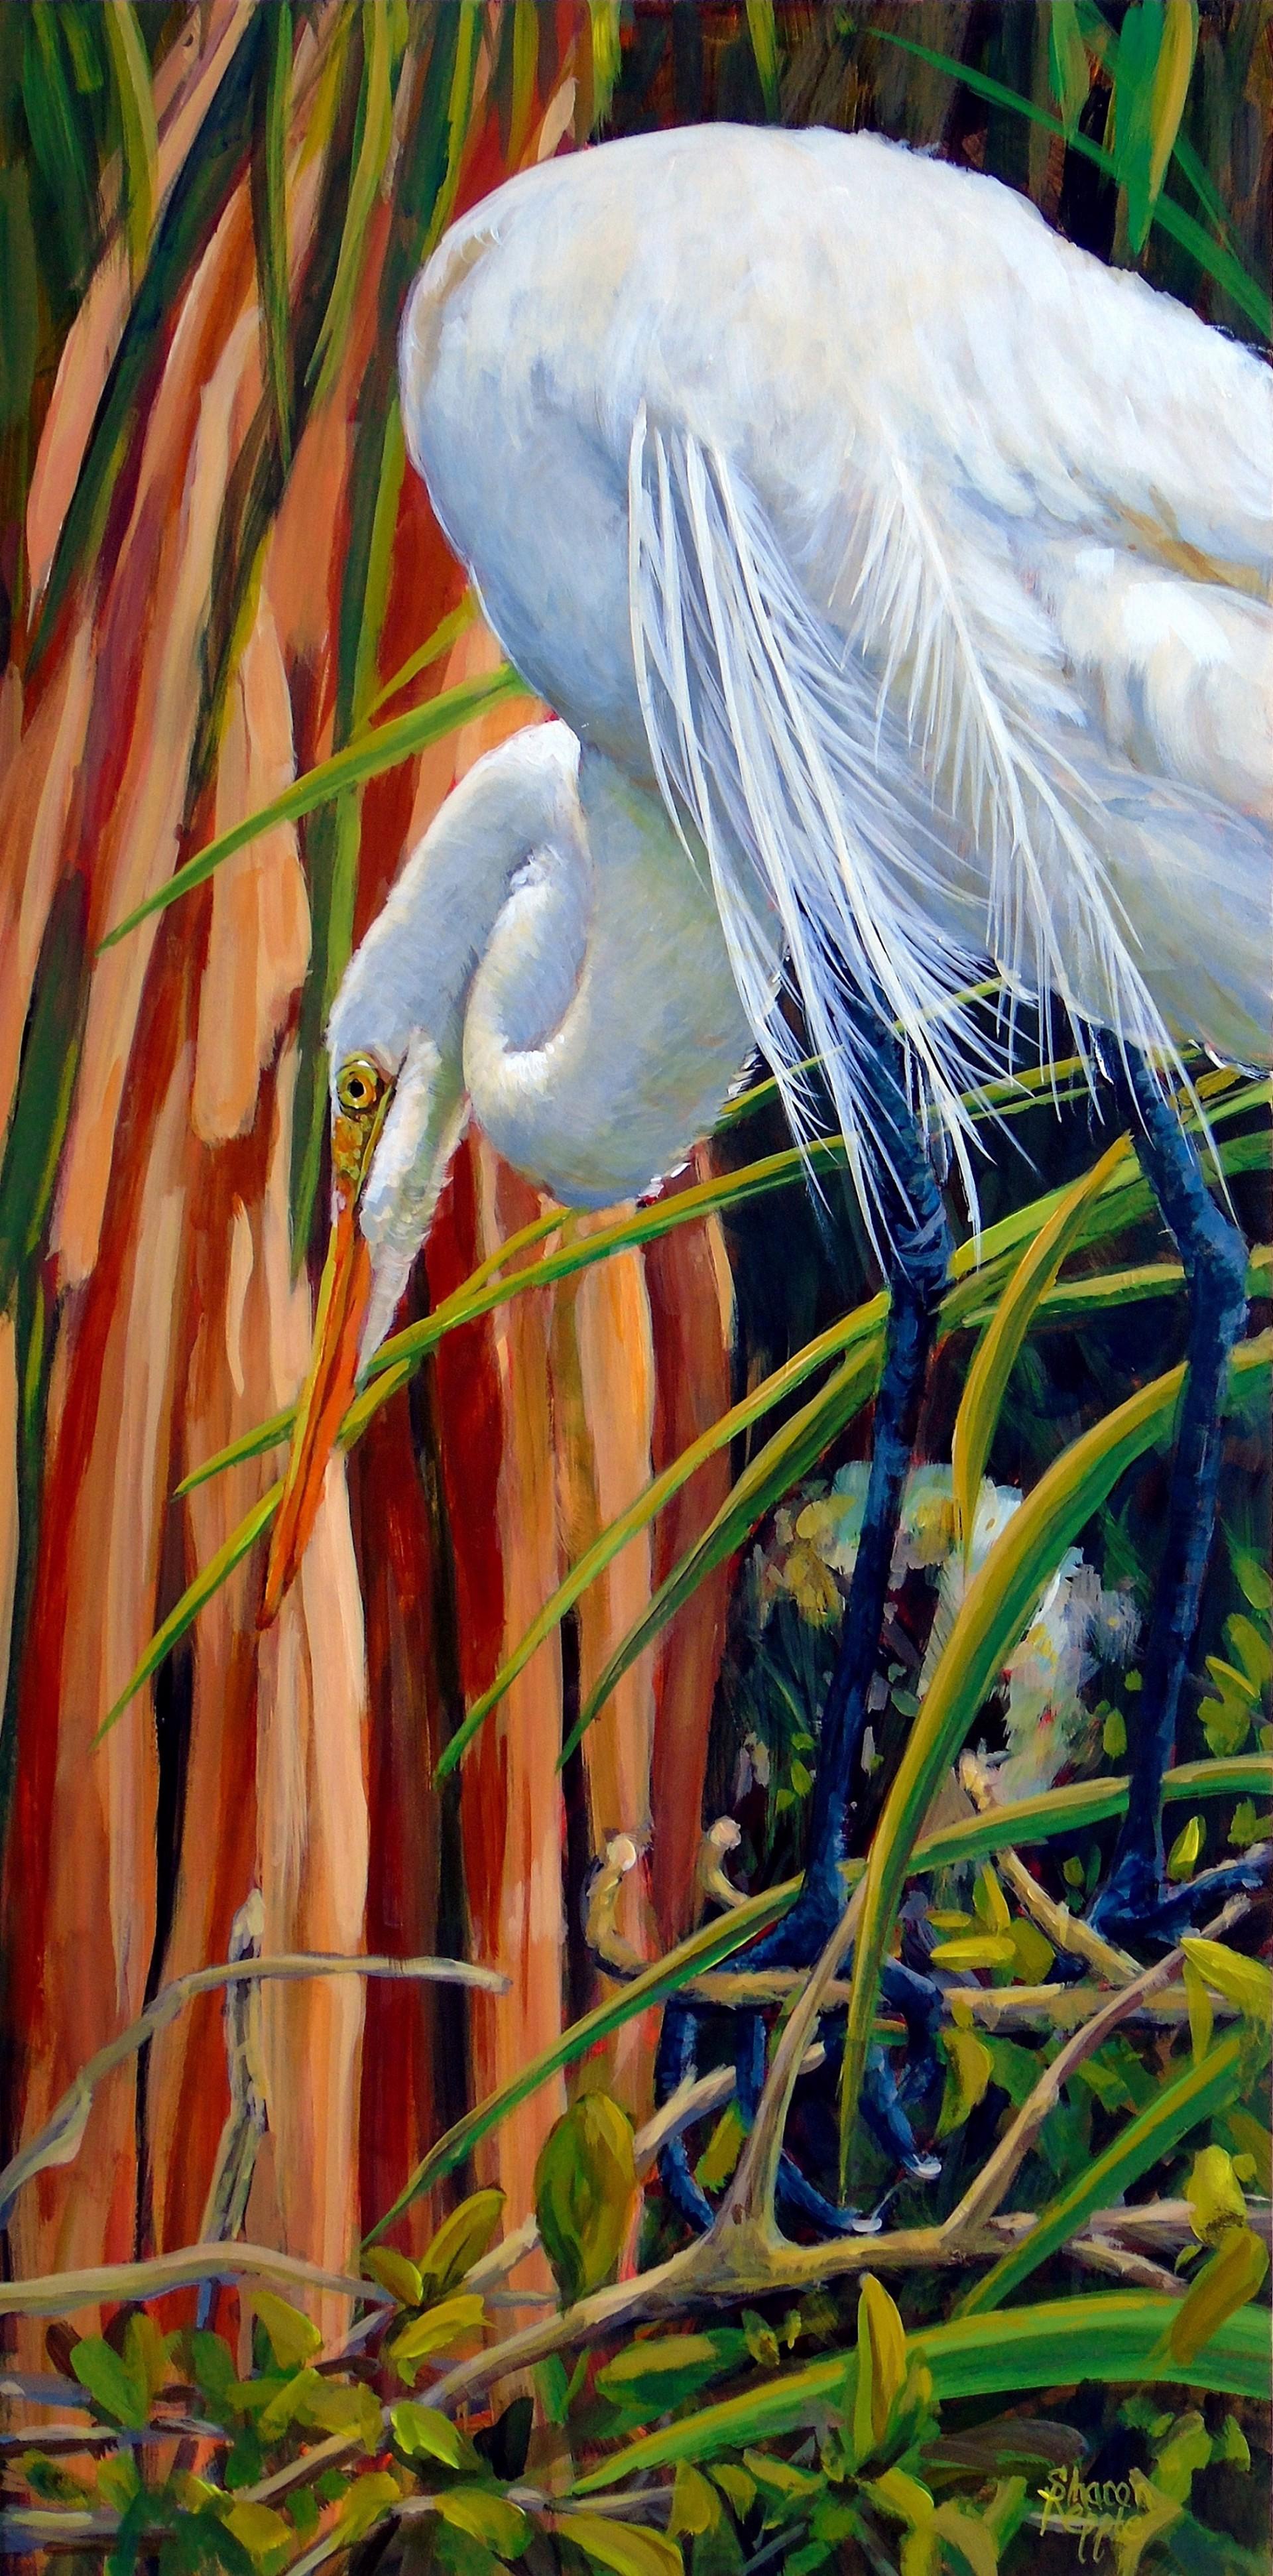 Great White Egret - Alligator Farm by Sharon Repple